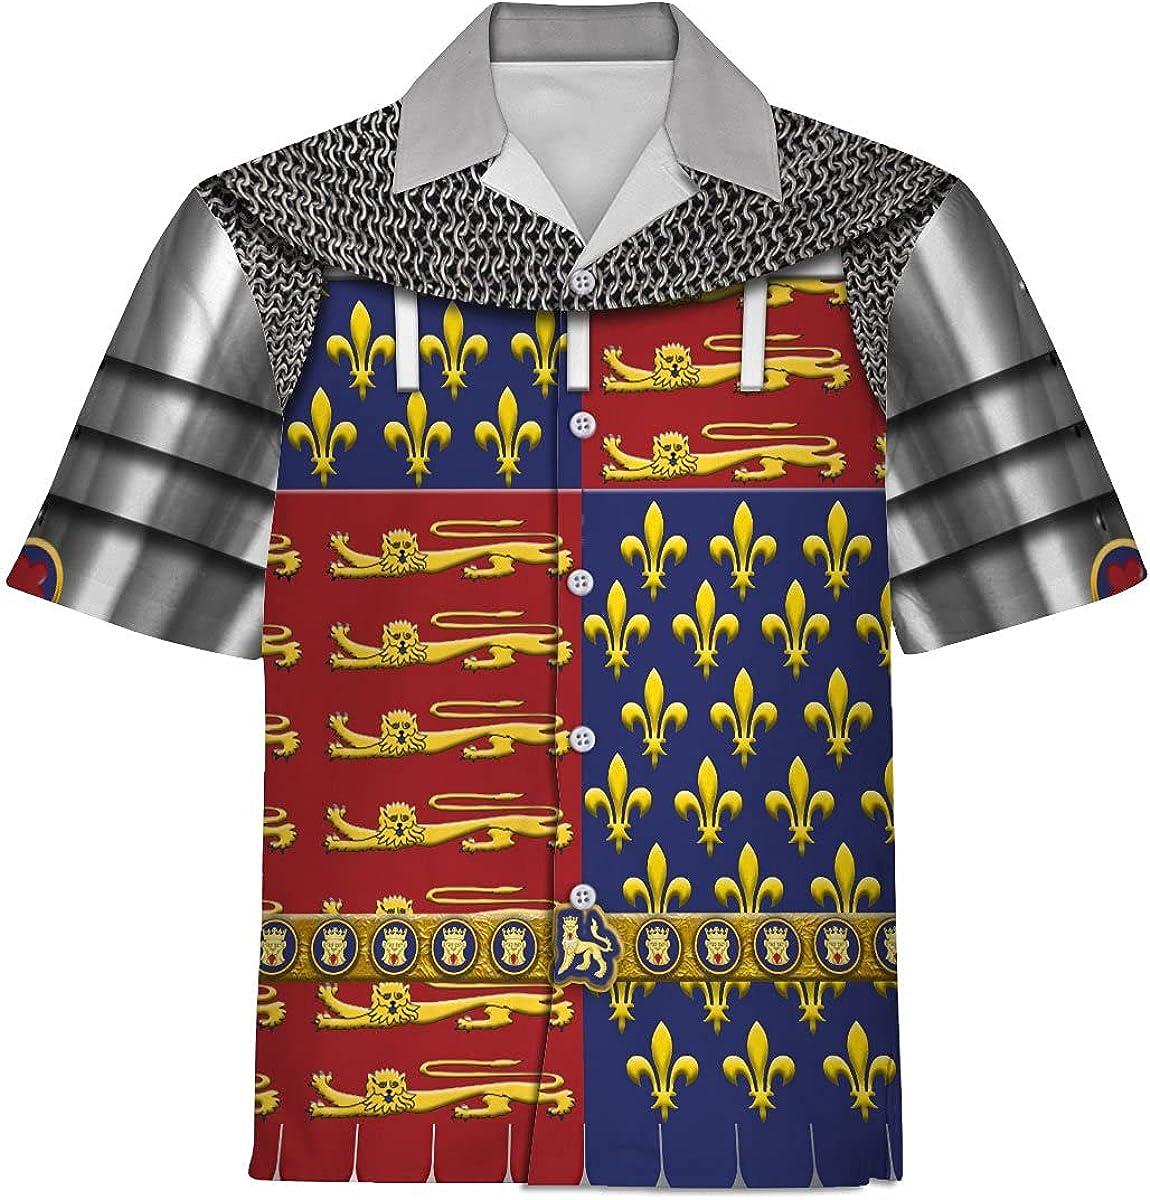 XStyles18 Unisex Hawaiian Shirt Memphis Mall Edward Hi Armor Prince Black The Department store